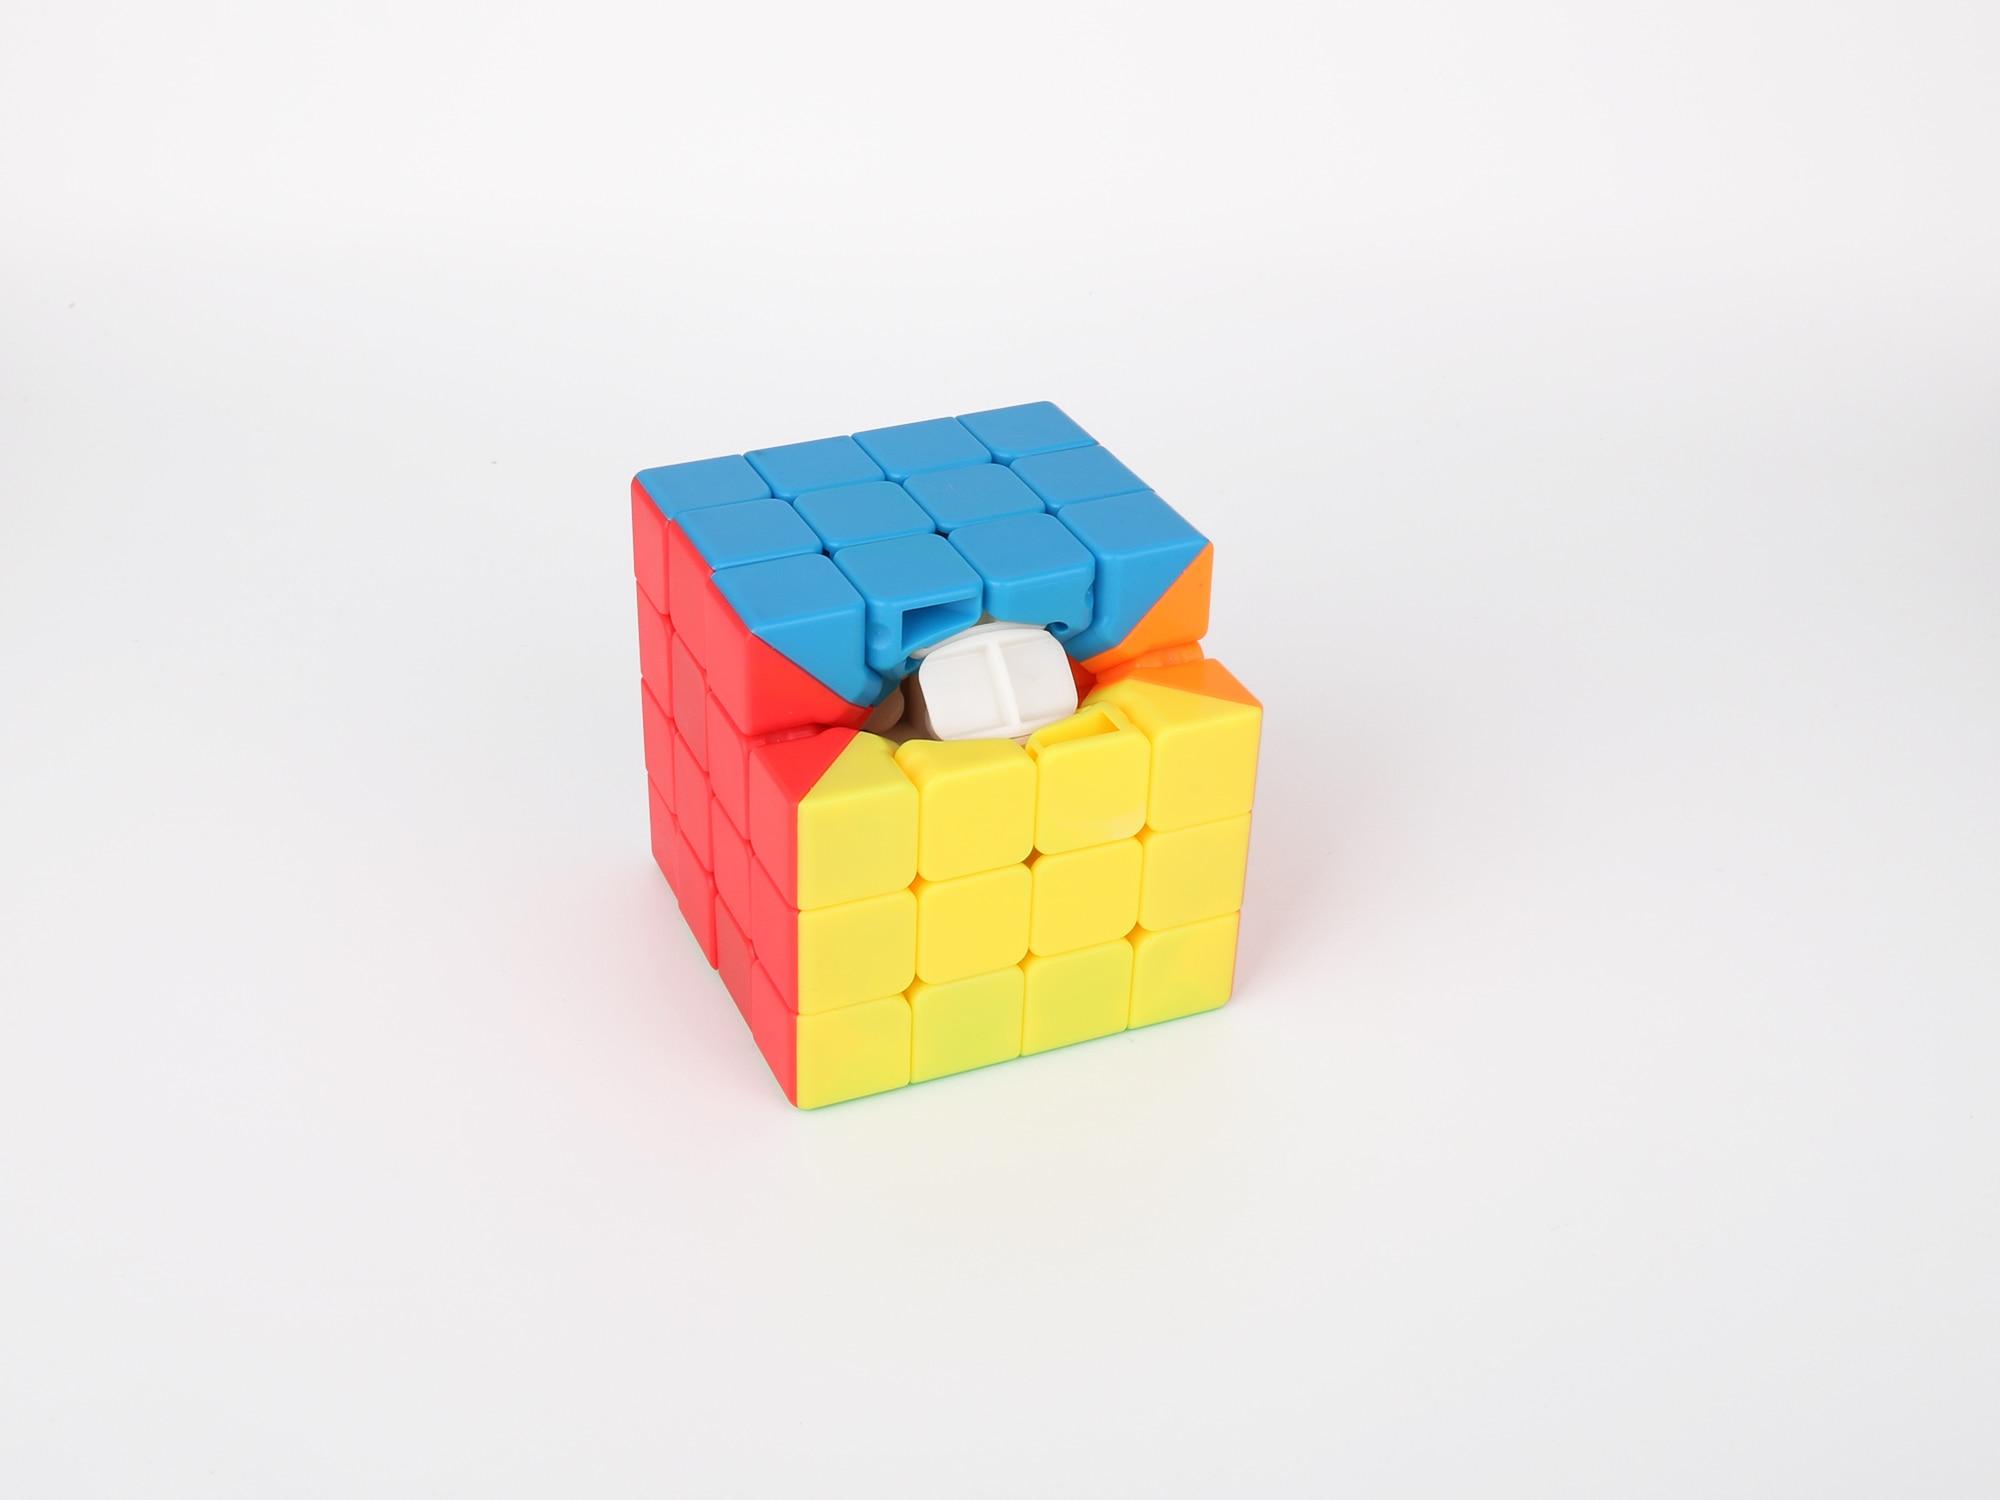 HelloCube Mofangjiaoshi Meilong cubing classroom MF4 4x4 magic cube stickerless 4x4x4 speed moyu cube kids toys educational 7